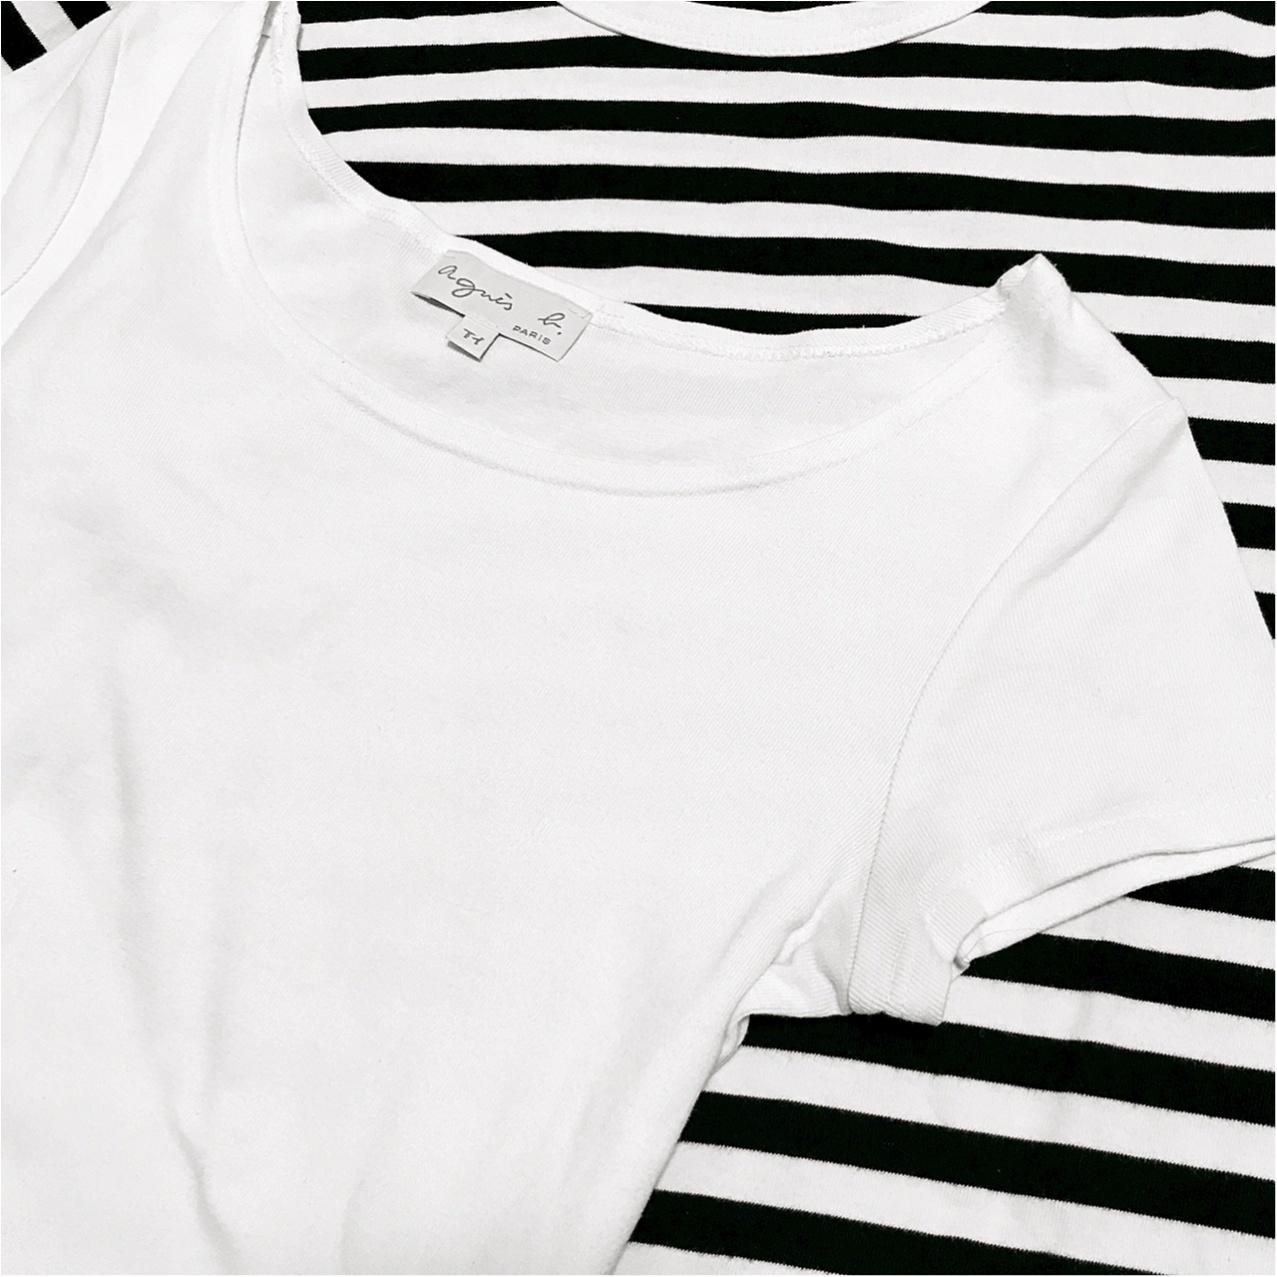 【agnes b.】きれいめにもカジュアルにも。一生モノの《白Tシャツ》!_1